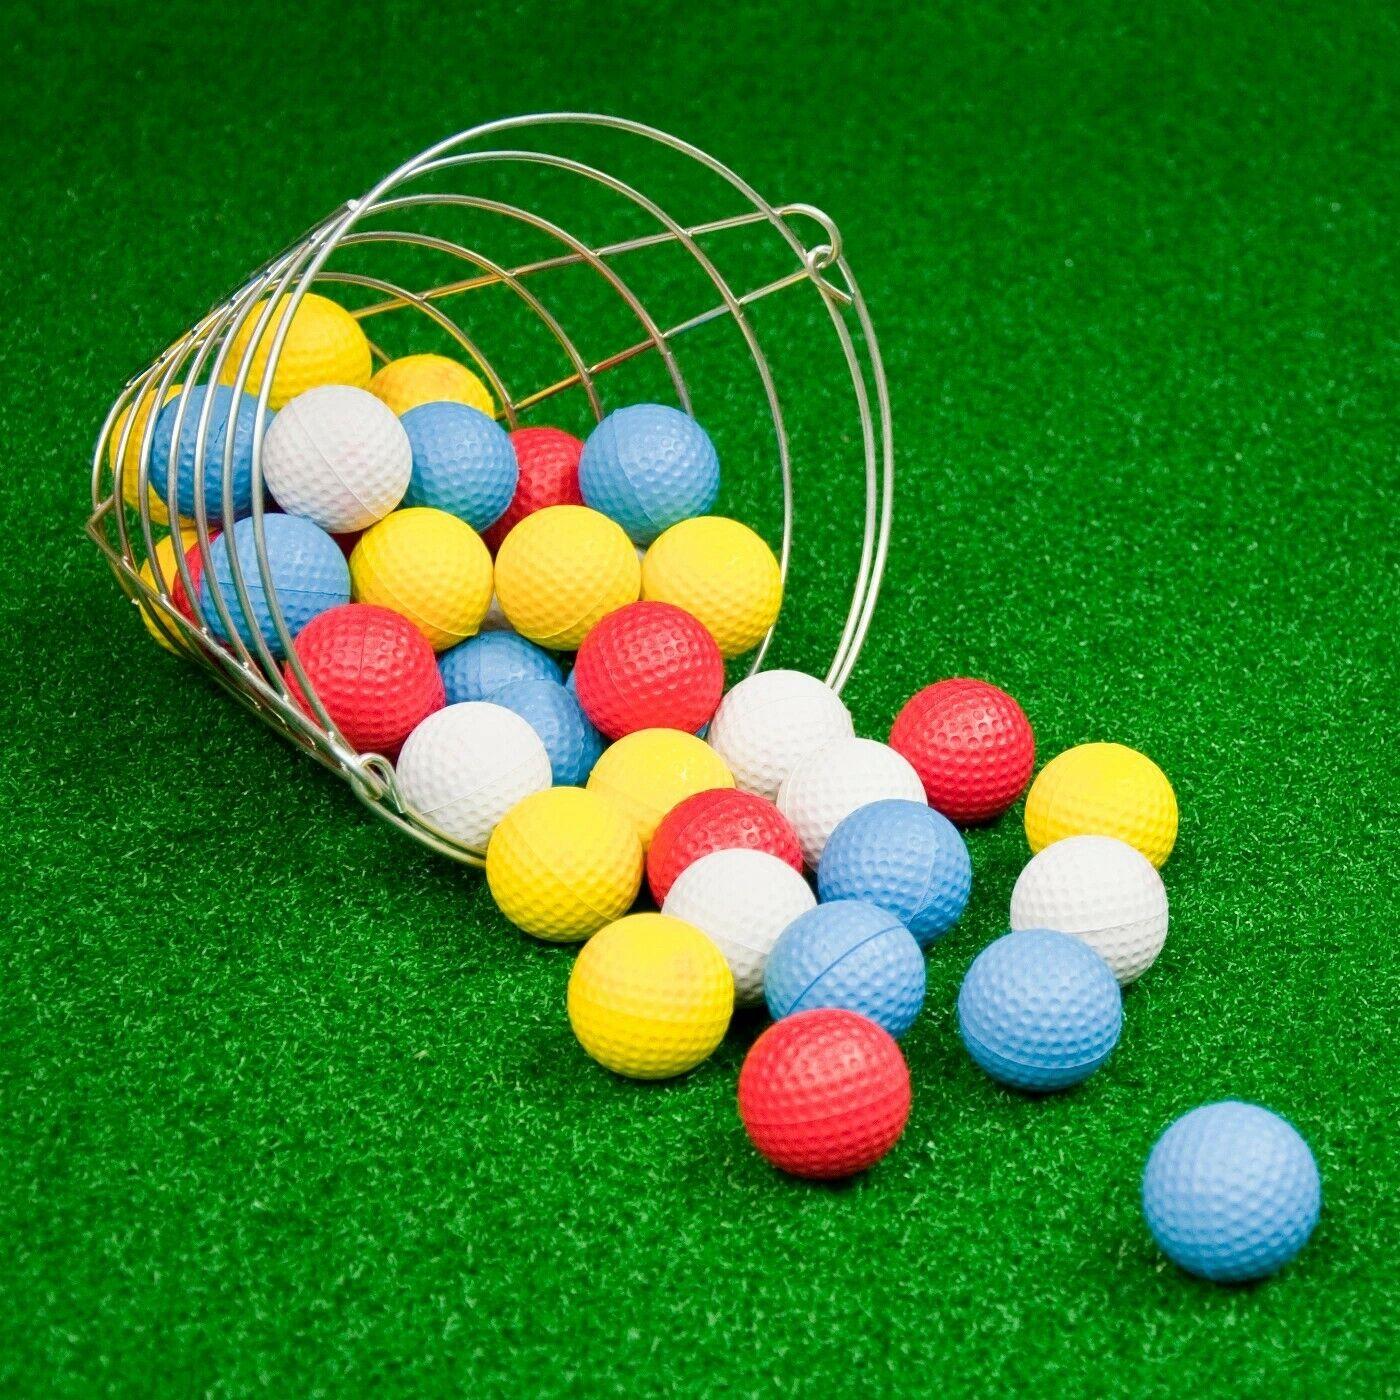 golf balls with basket 42 pk foam